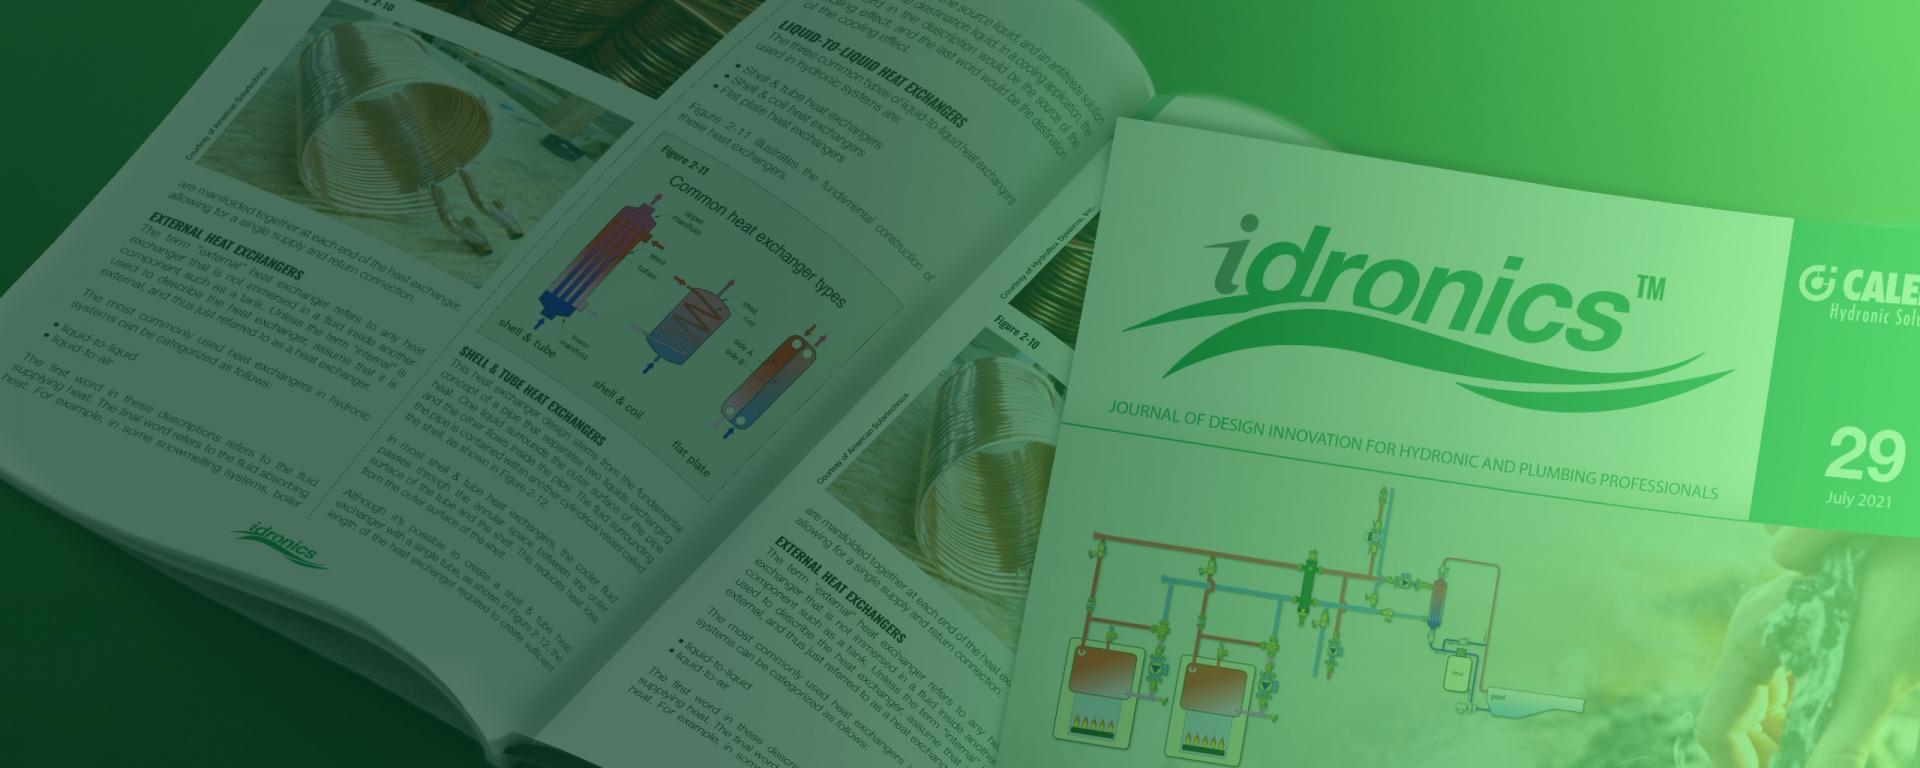 Interactive idronics